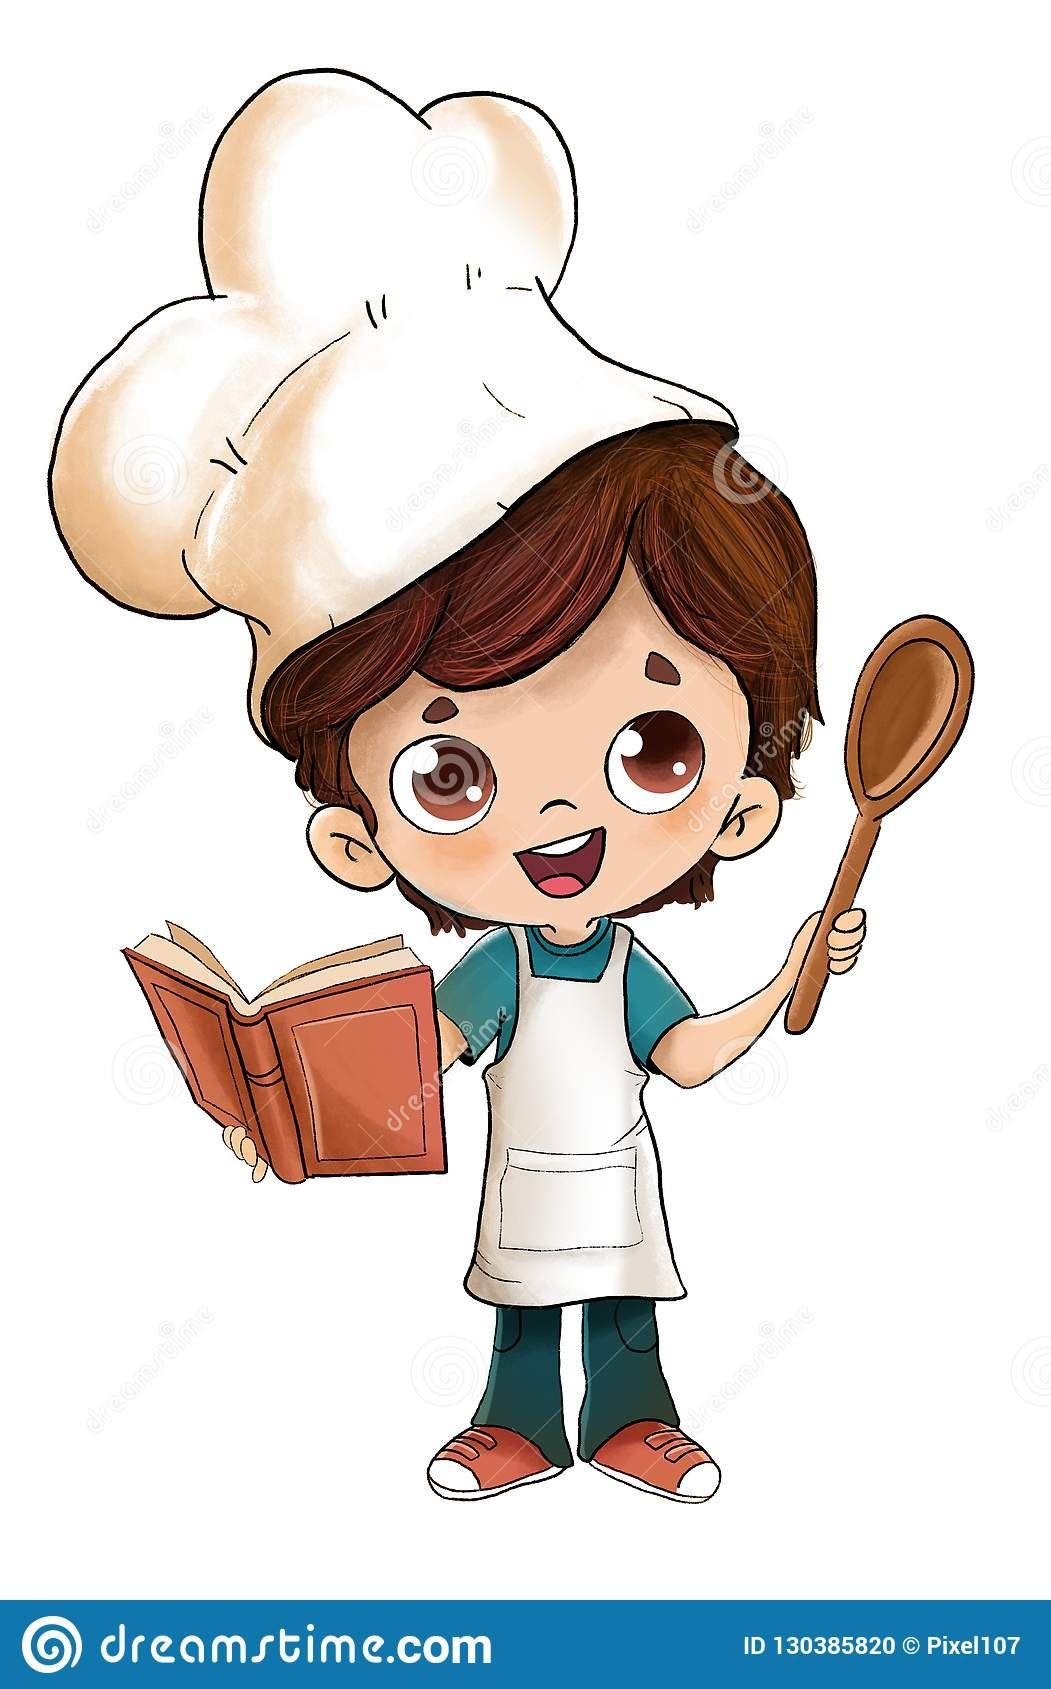 Cooking Cartoon Images : cooking, cartoon, images, Cooking, Images, Cartoon, Drawings,, Little, Drawing,